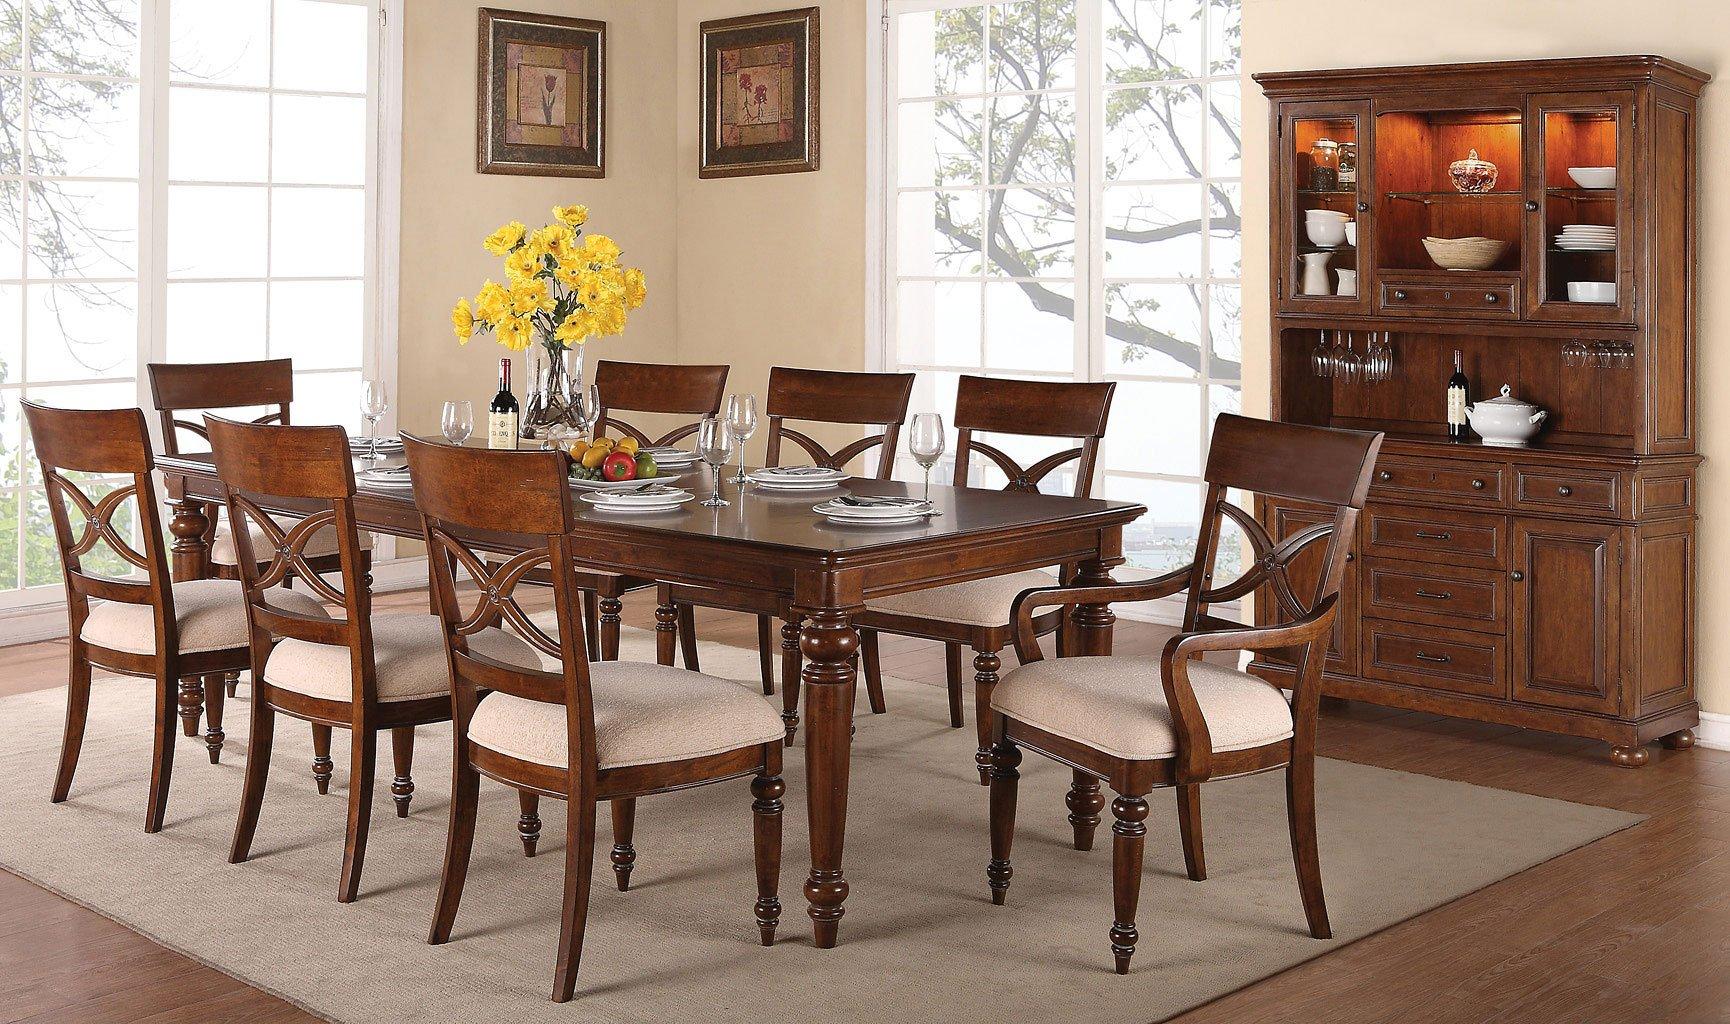 Merveilleux American Heritage Dining Room Set